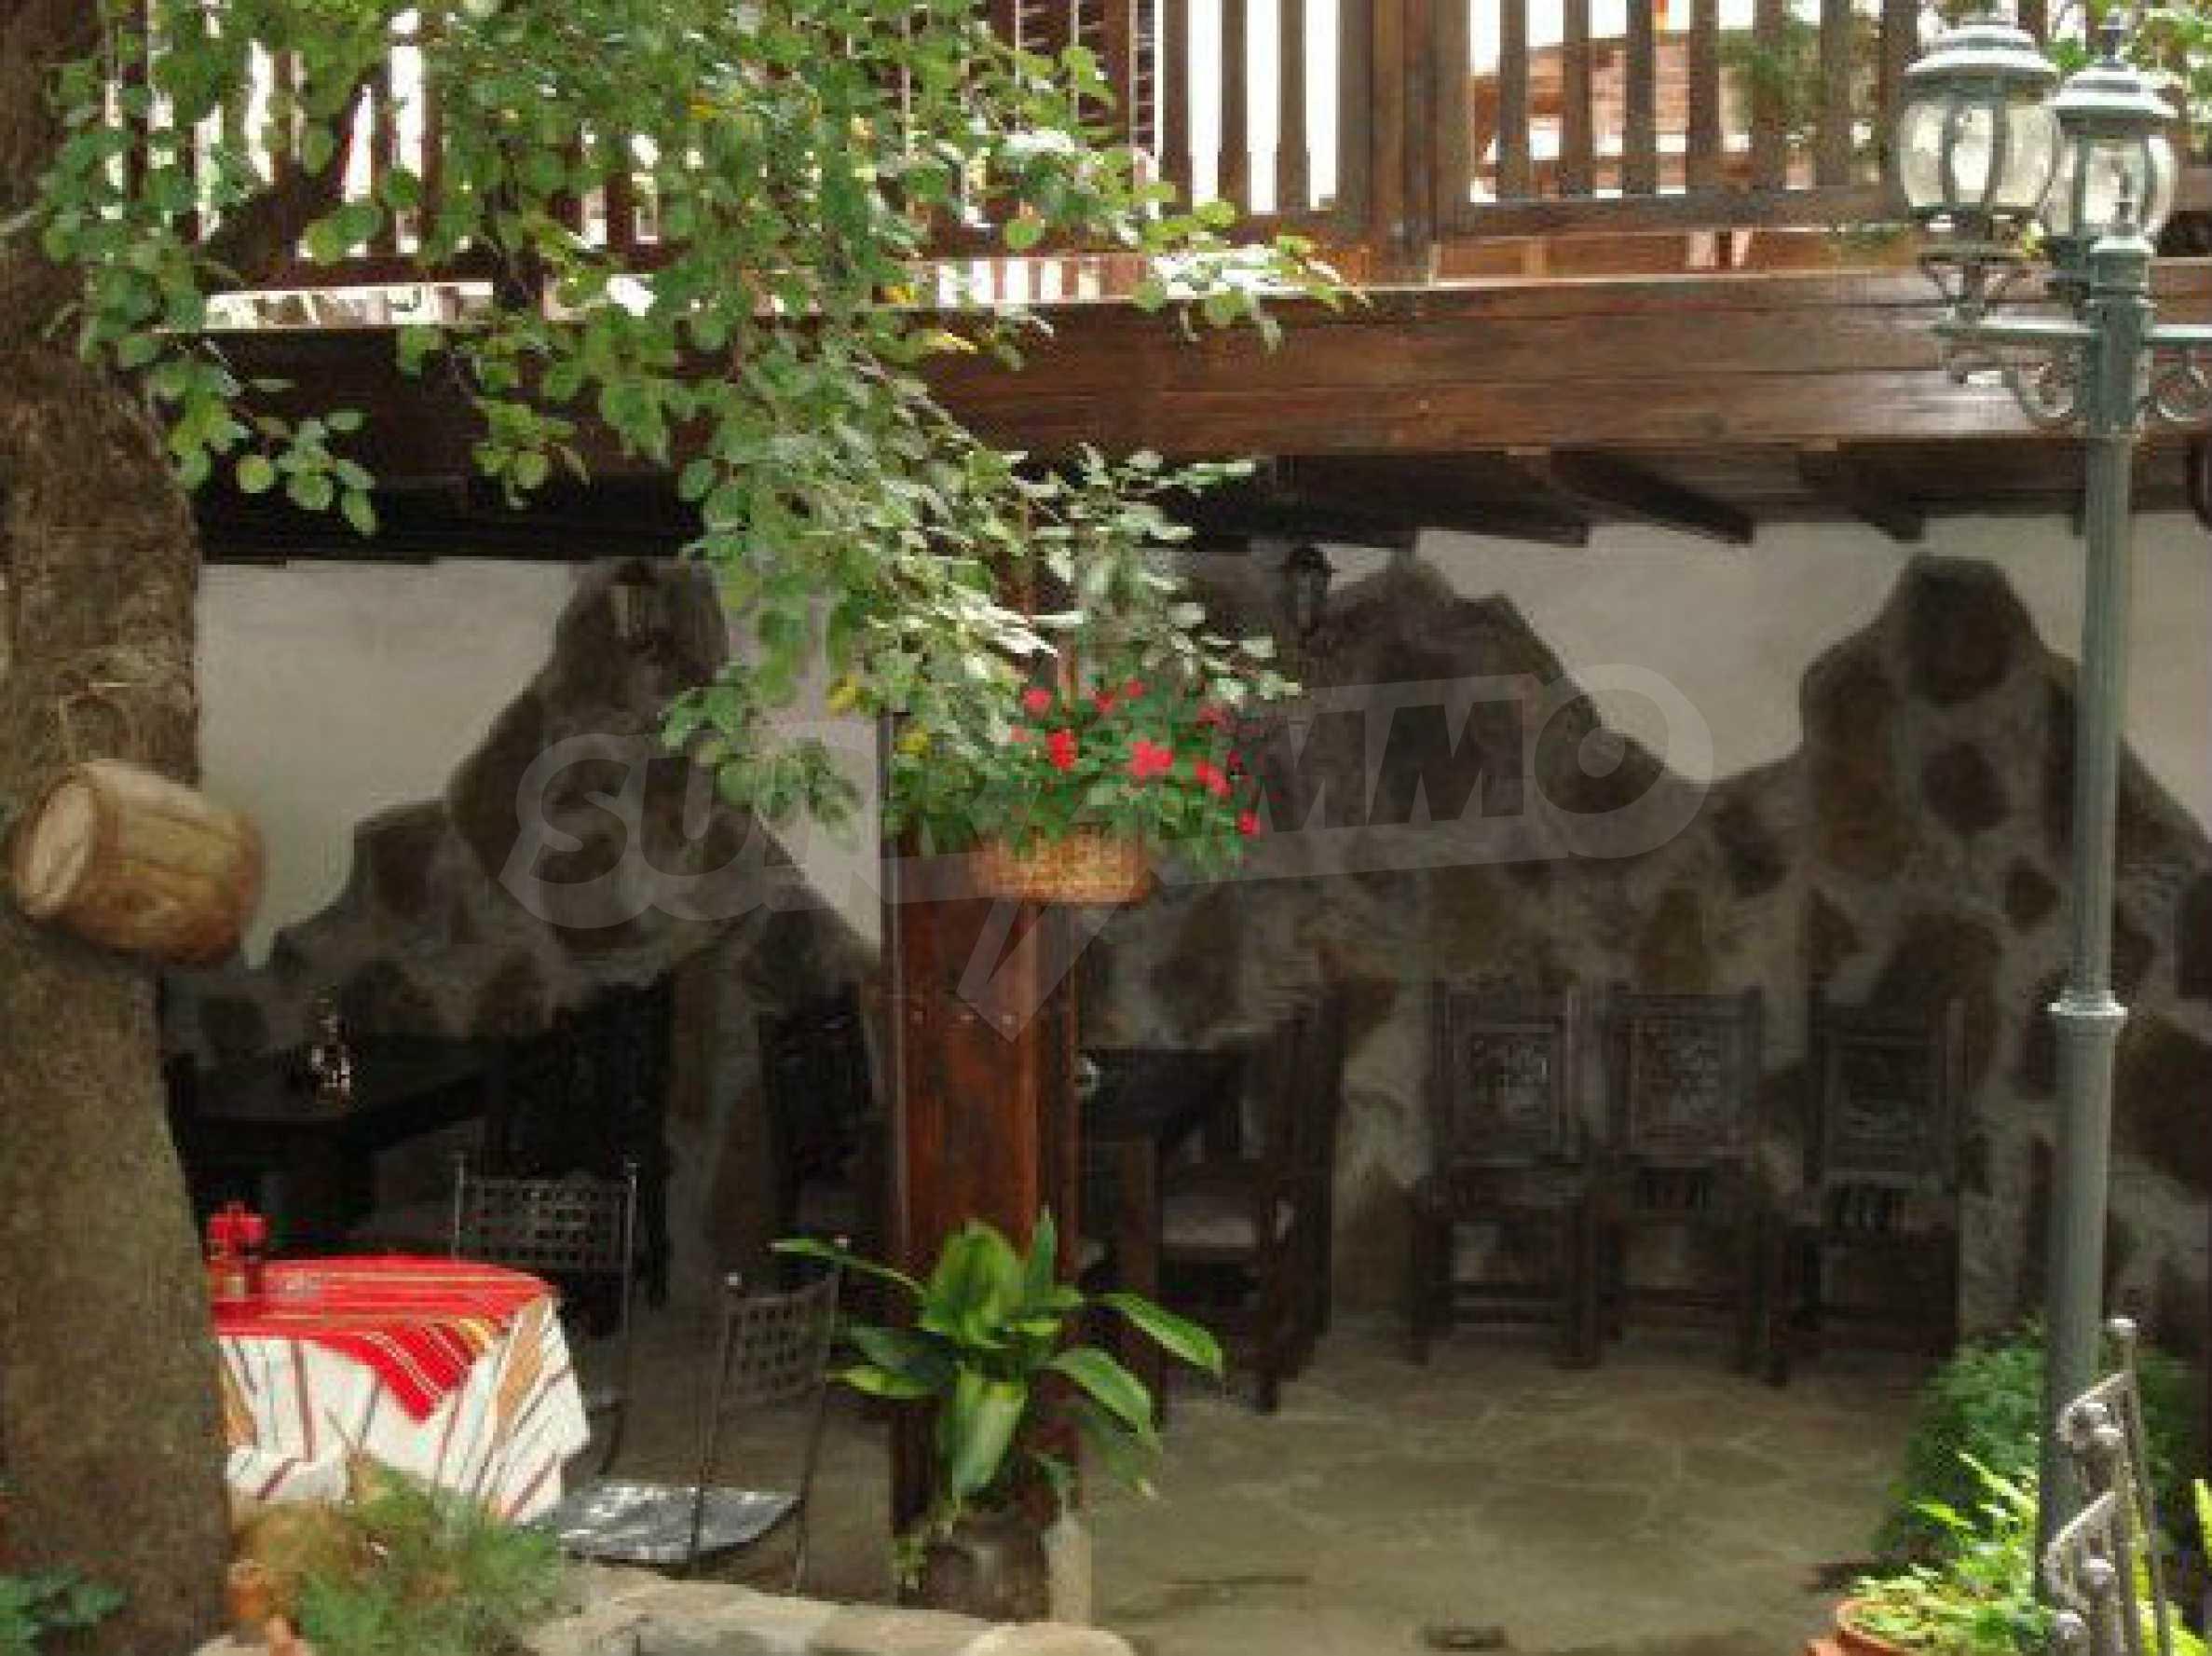 Hotelanlage mit Restaurant am Ufer des Flusses Osam in Lovech 59